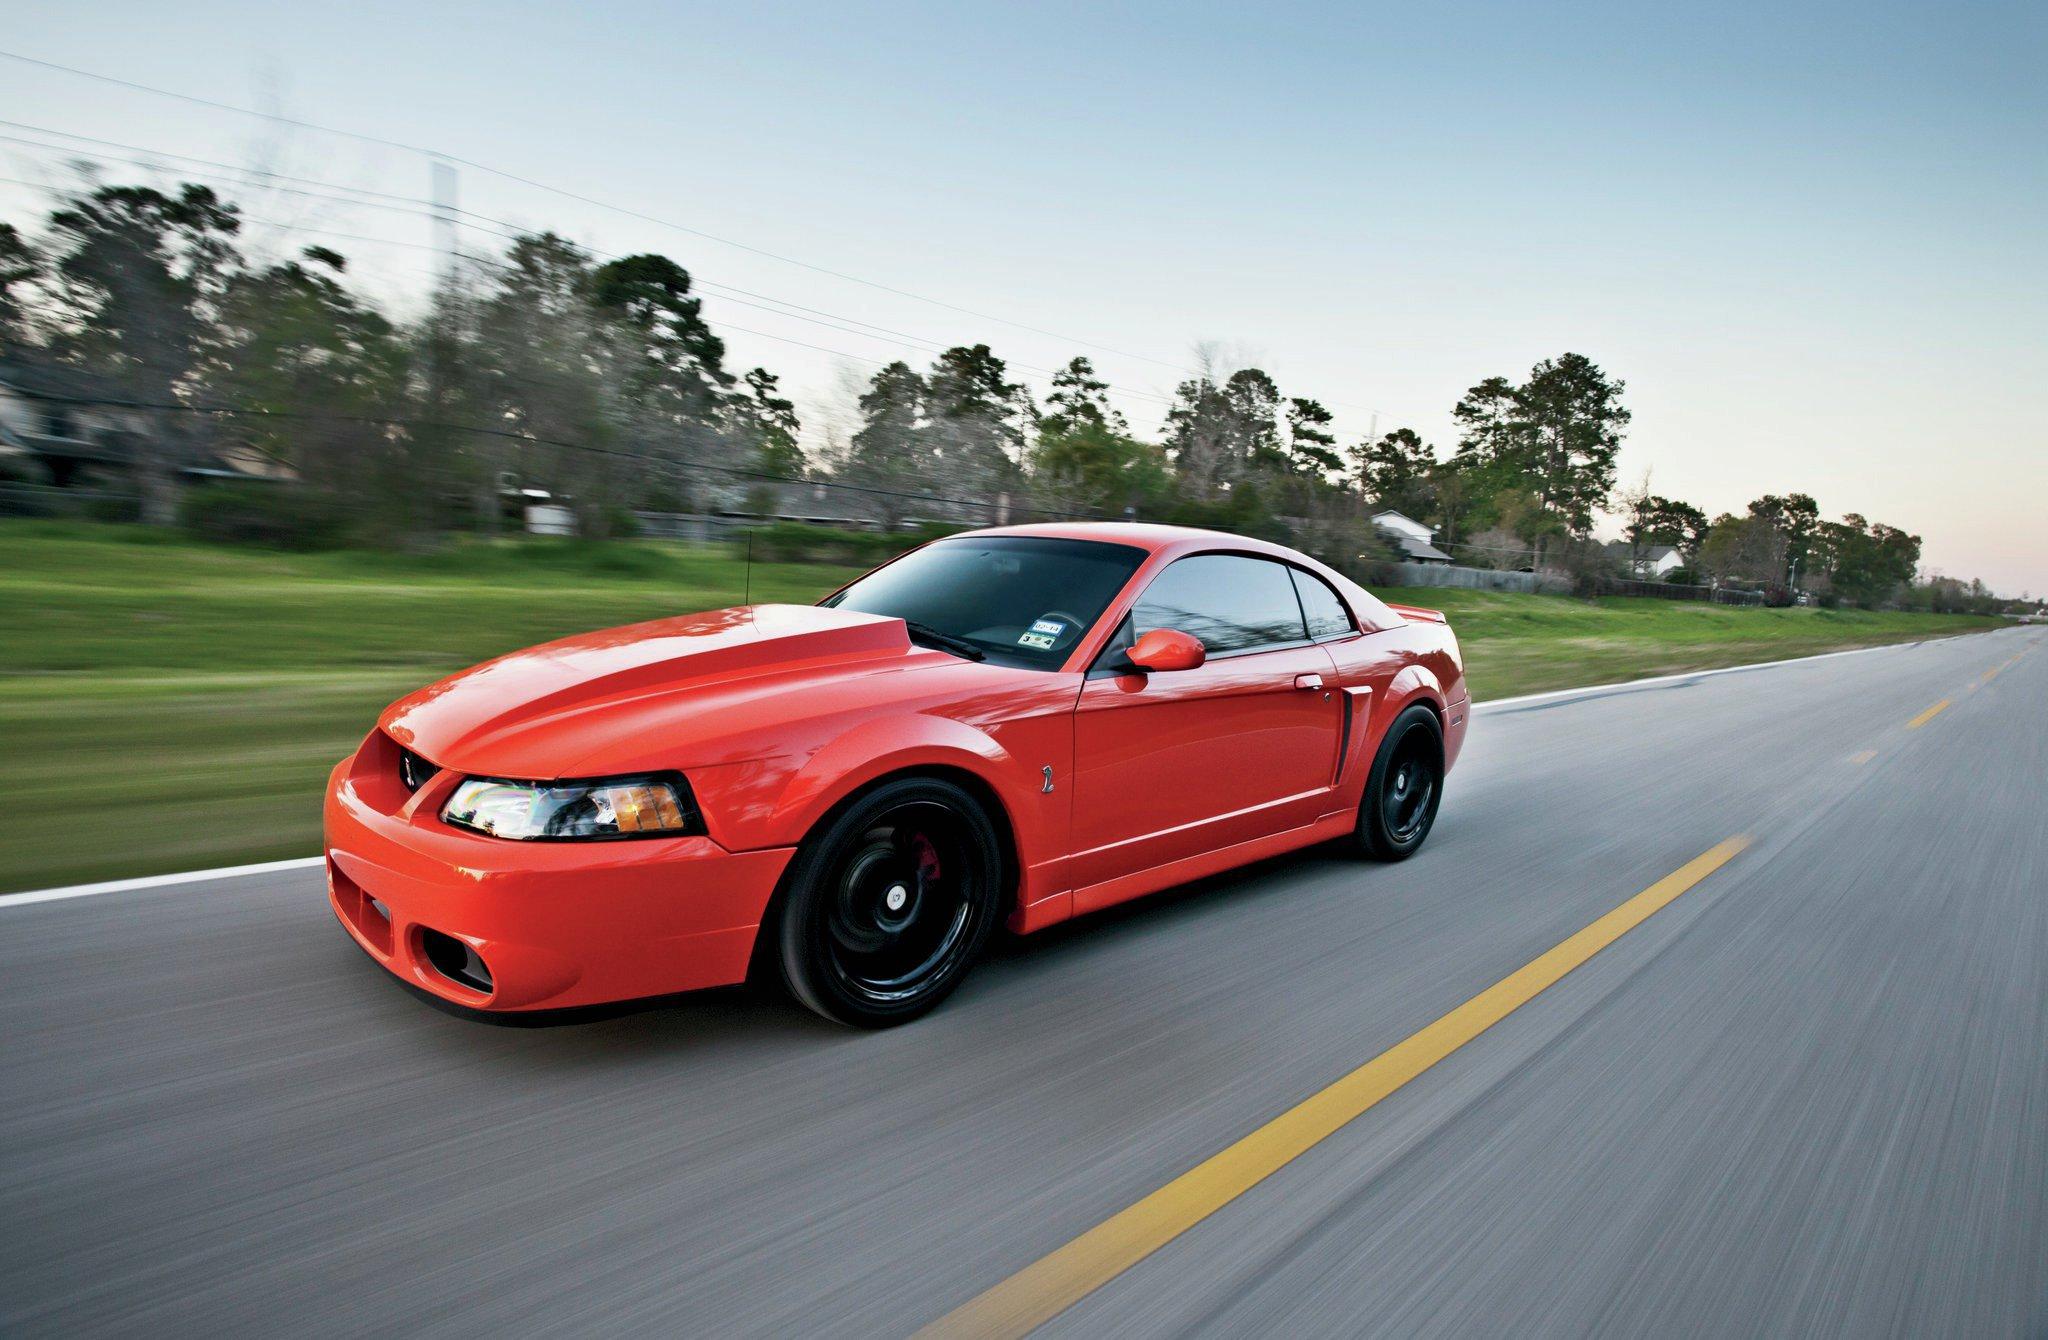 2004 Ford Mustang Cobra